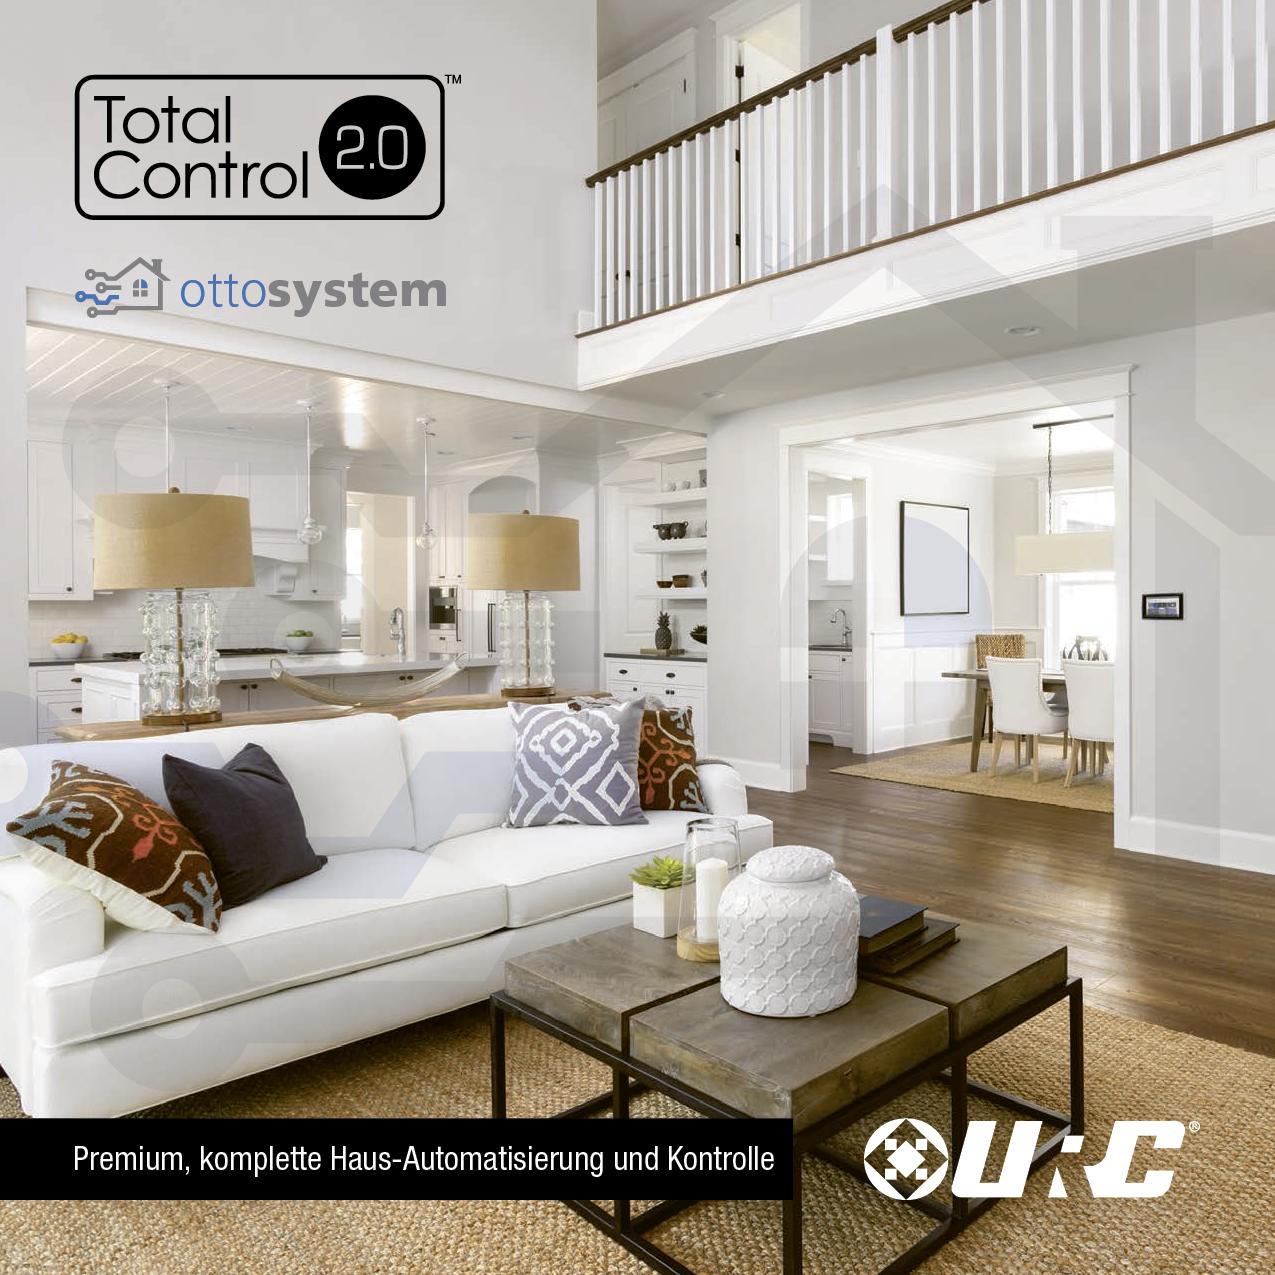 URC_Total_Control_ottosystem-01